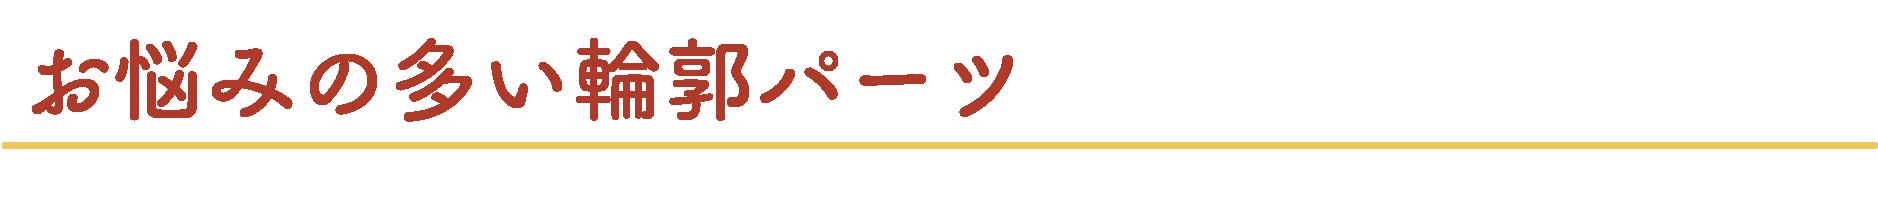 midashi 20 - 輪郭美顔コース